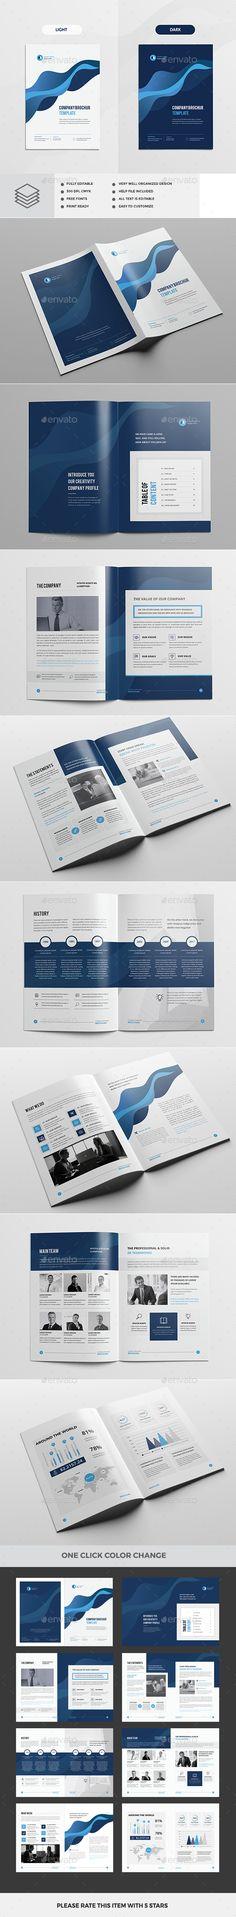 Clean & Modern Multipurpose Brochure Template InDesign INDD